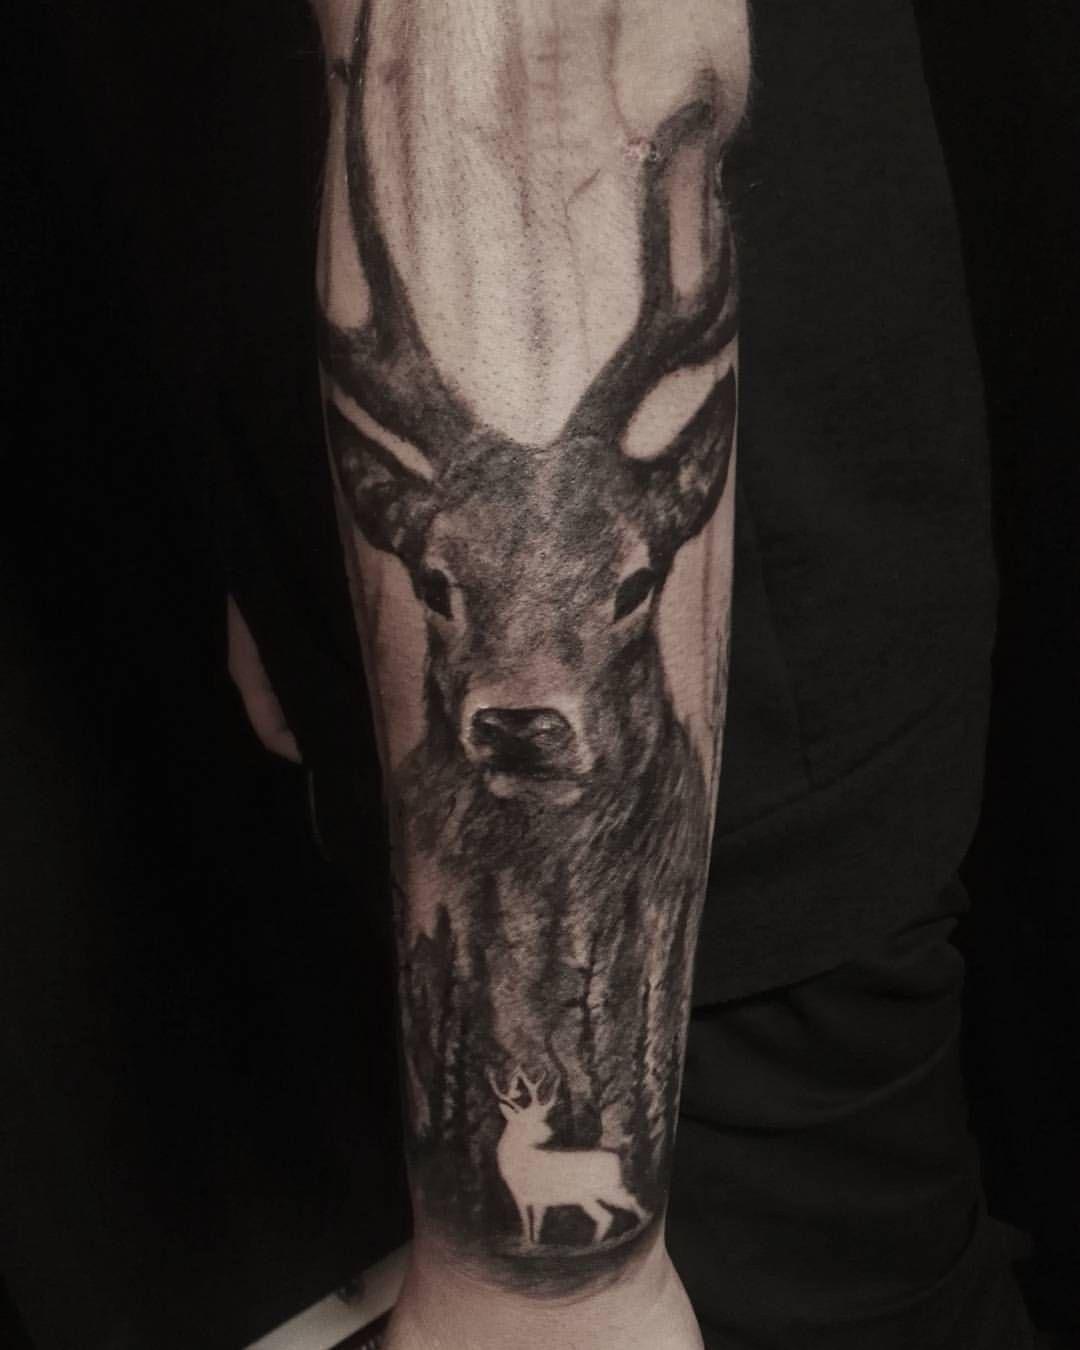 Bosque Forest Brazo En Proceso Tatuajes De Venados Tatuajes De